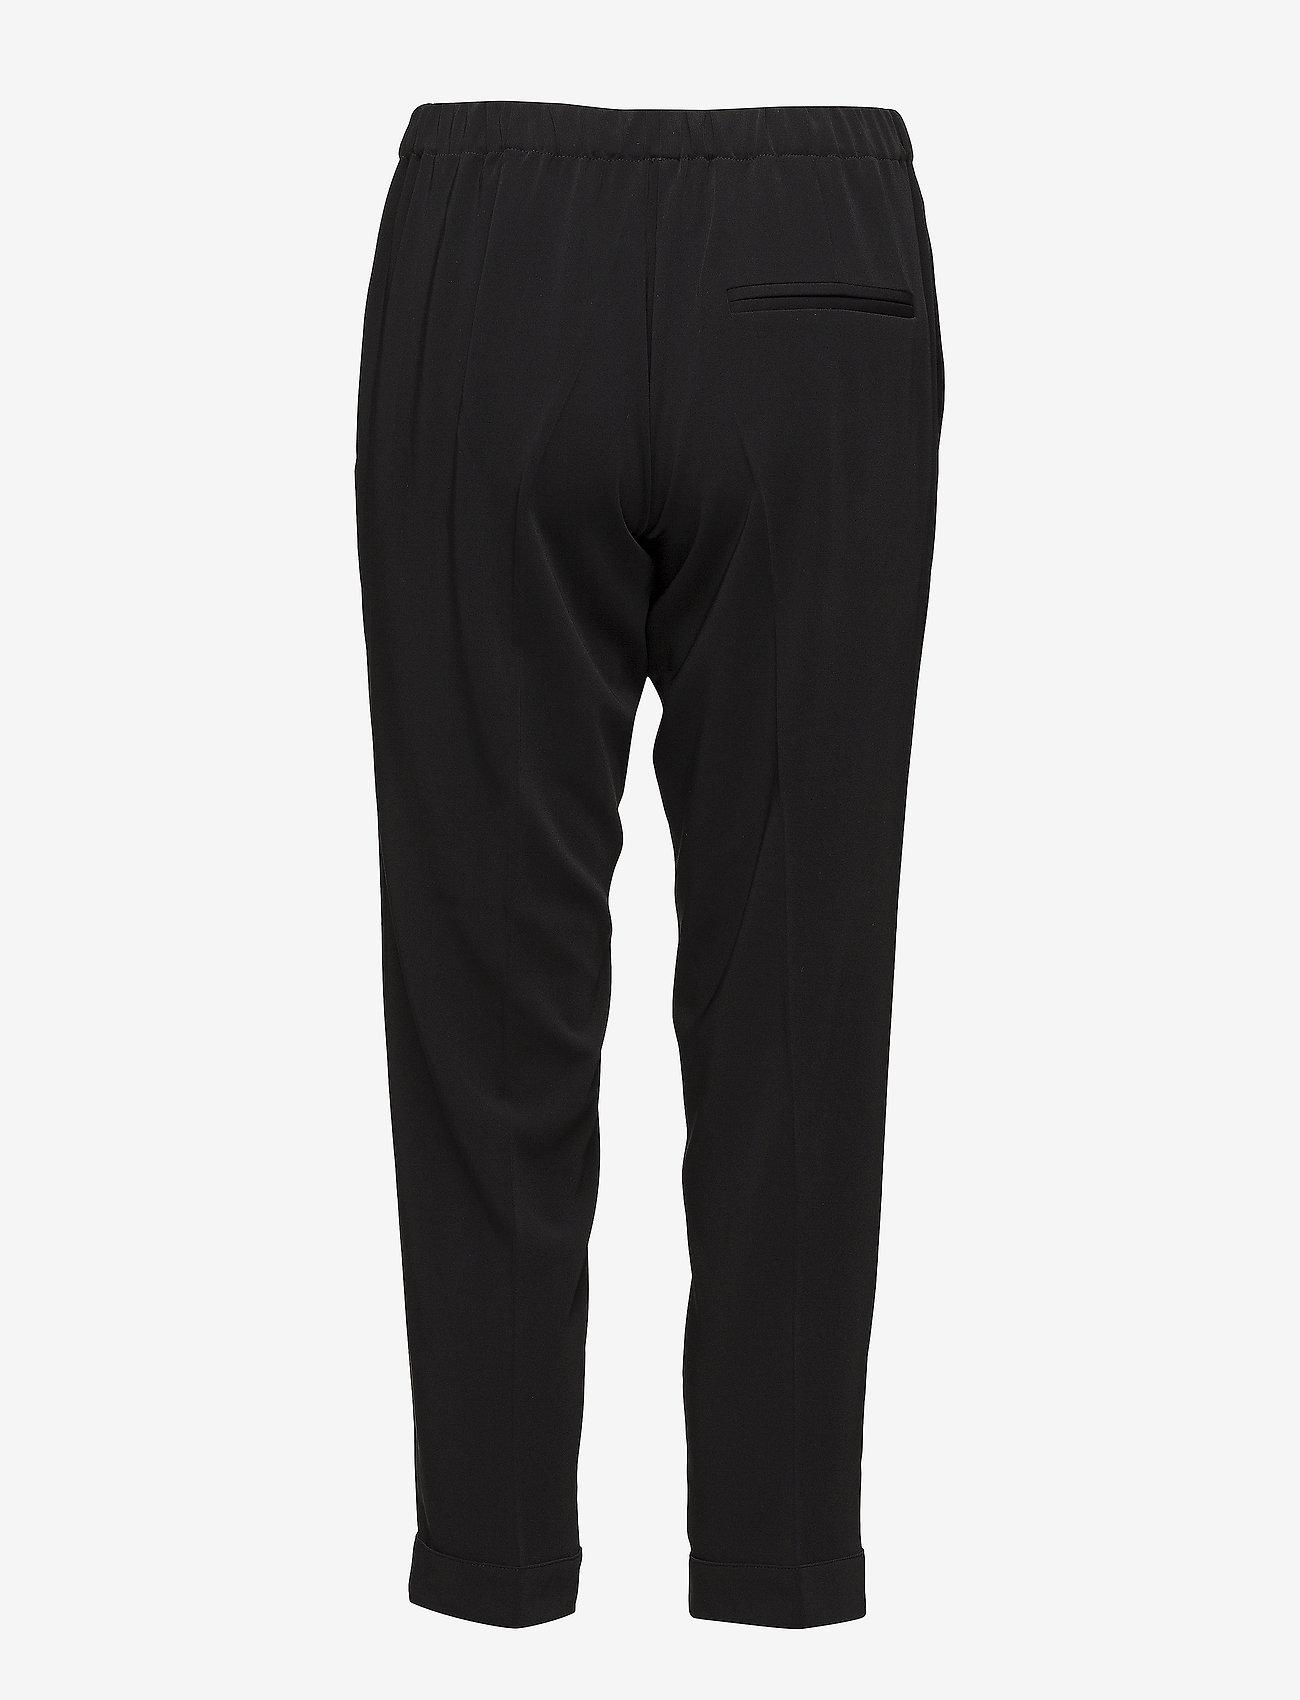 Hoys Pants 6528   - Samsøe Samsøe -  Women's Trousers Popular